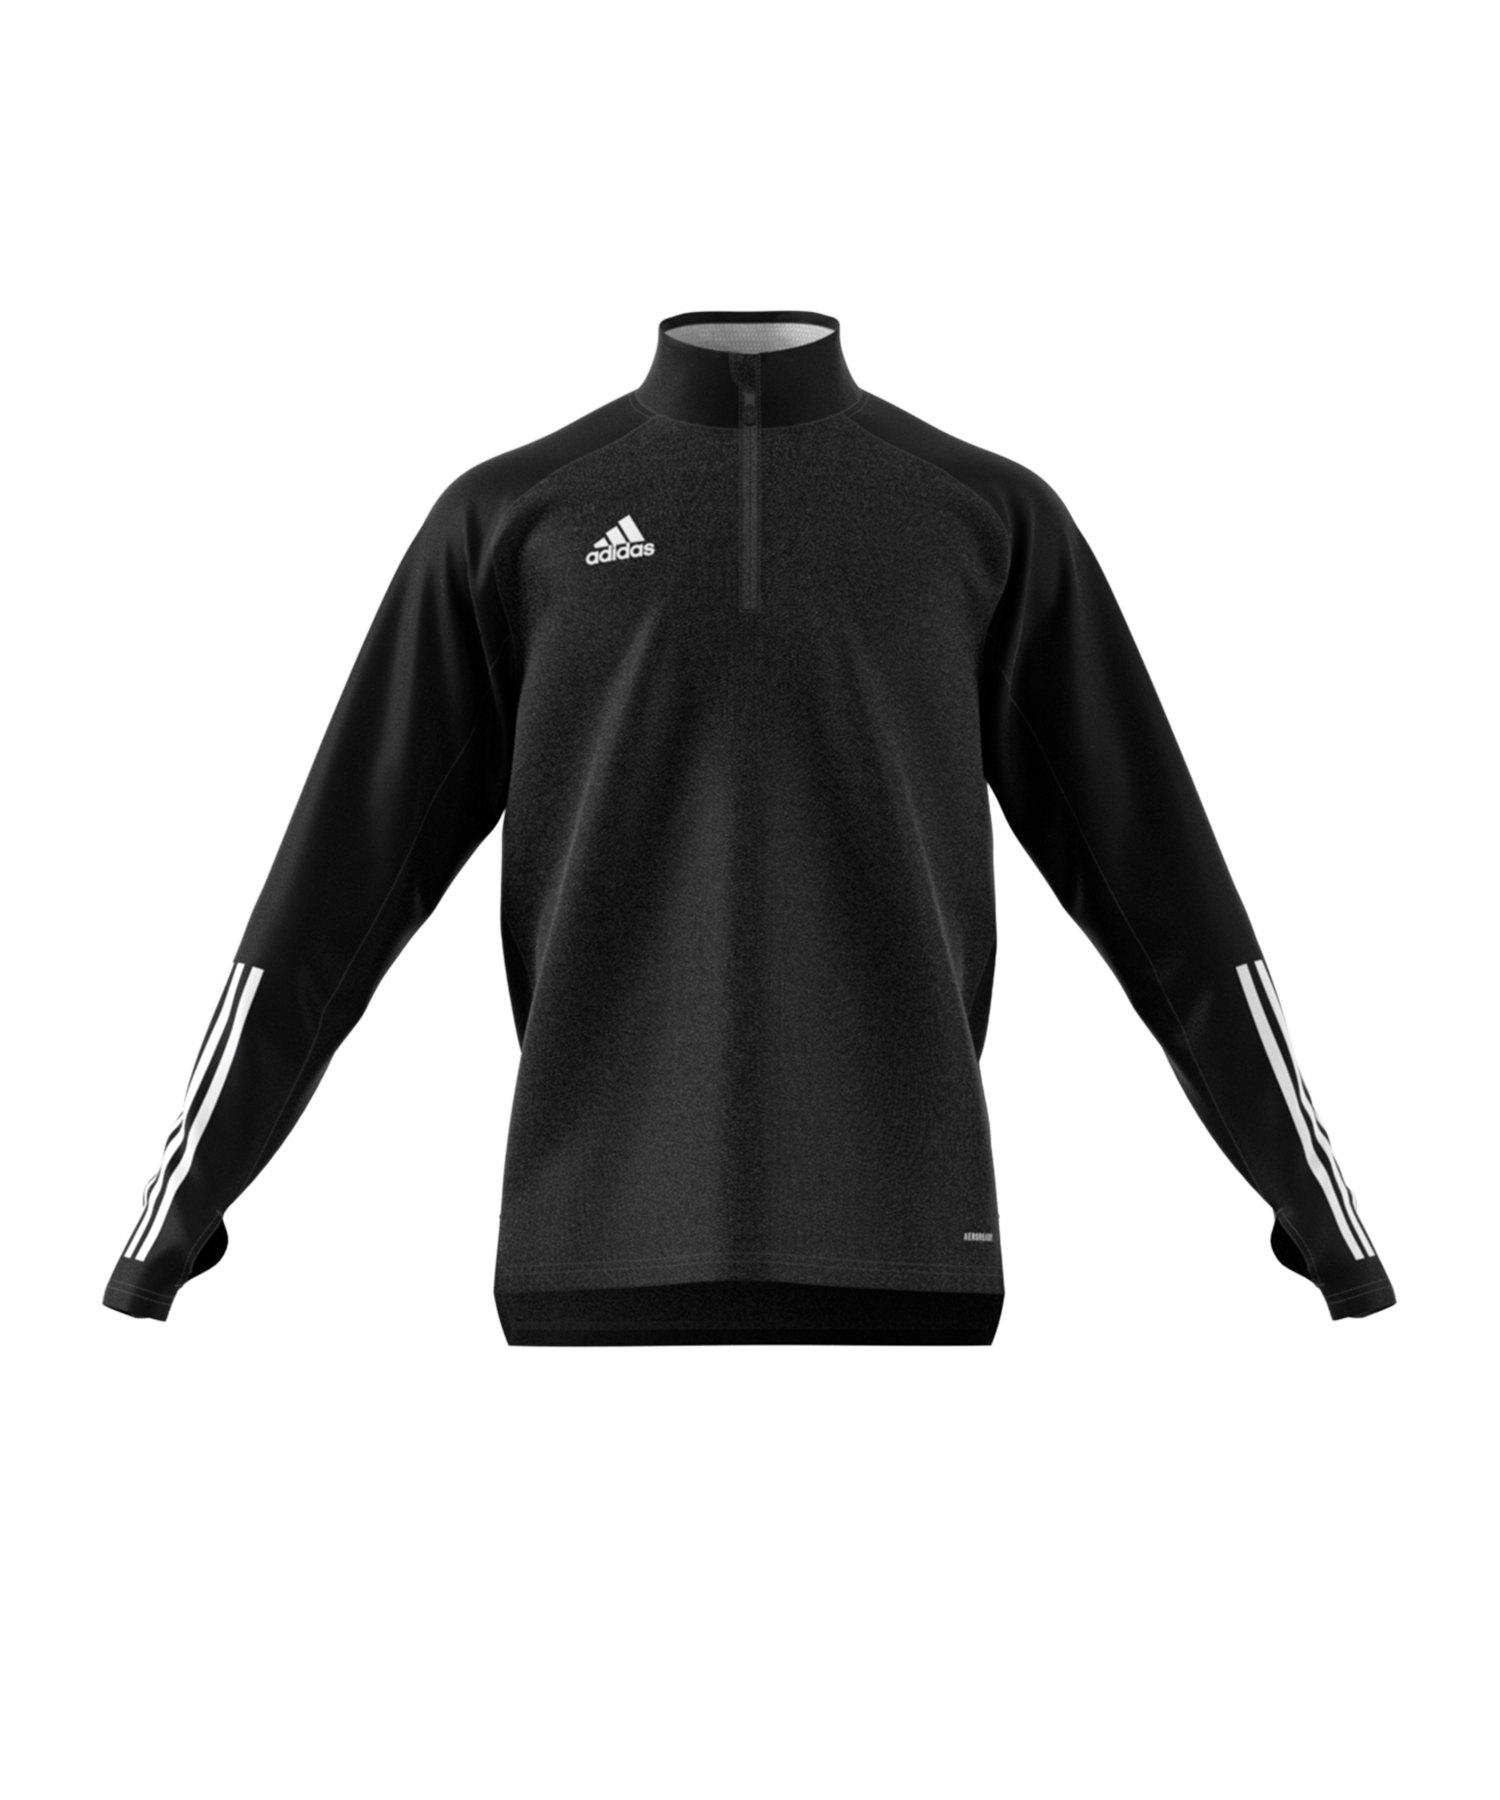 adidas Condivo 20 Warm Sweatshirt LA Schwarz - schwarz